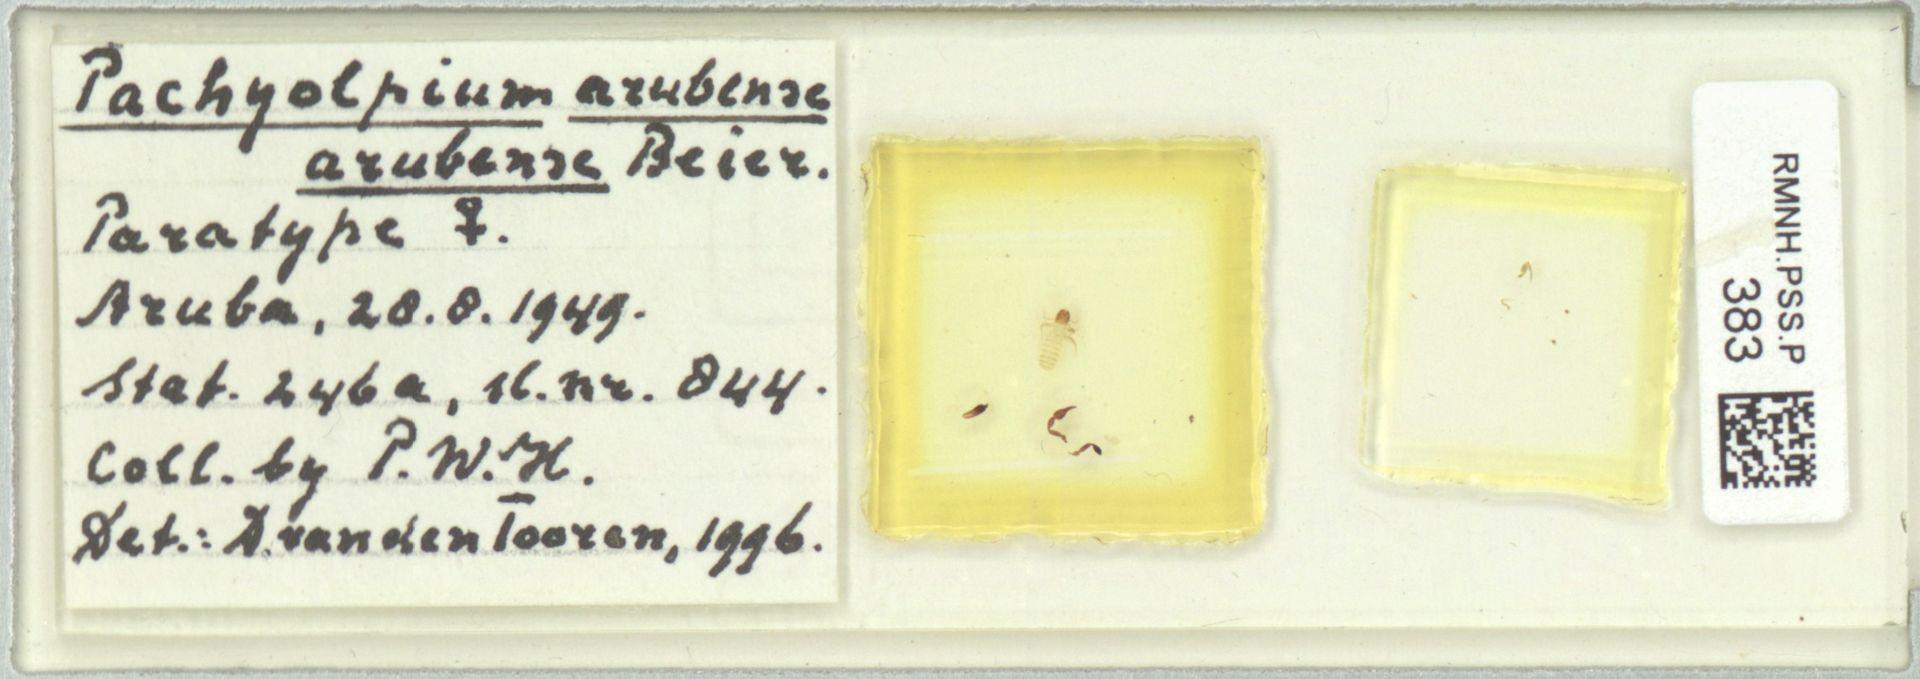 RMNH.PSS.P.383 | Pachyolpium arubense arubense